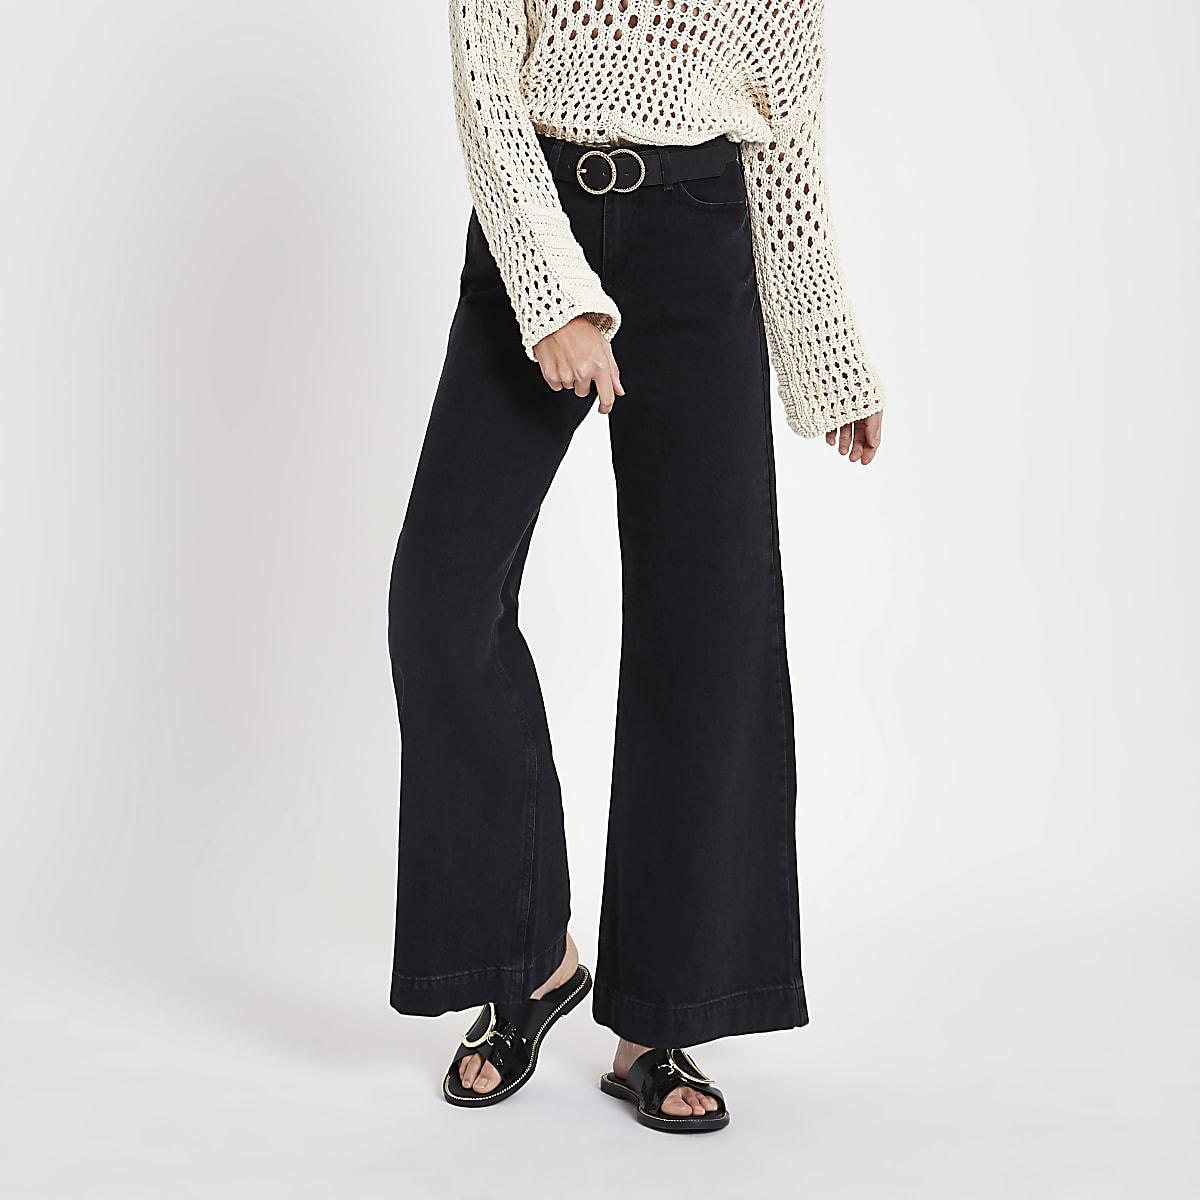 Black Mila wide leg jeans